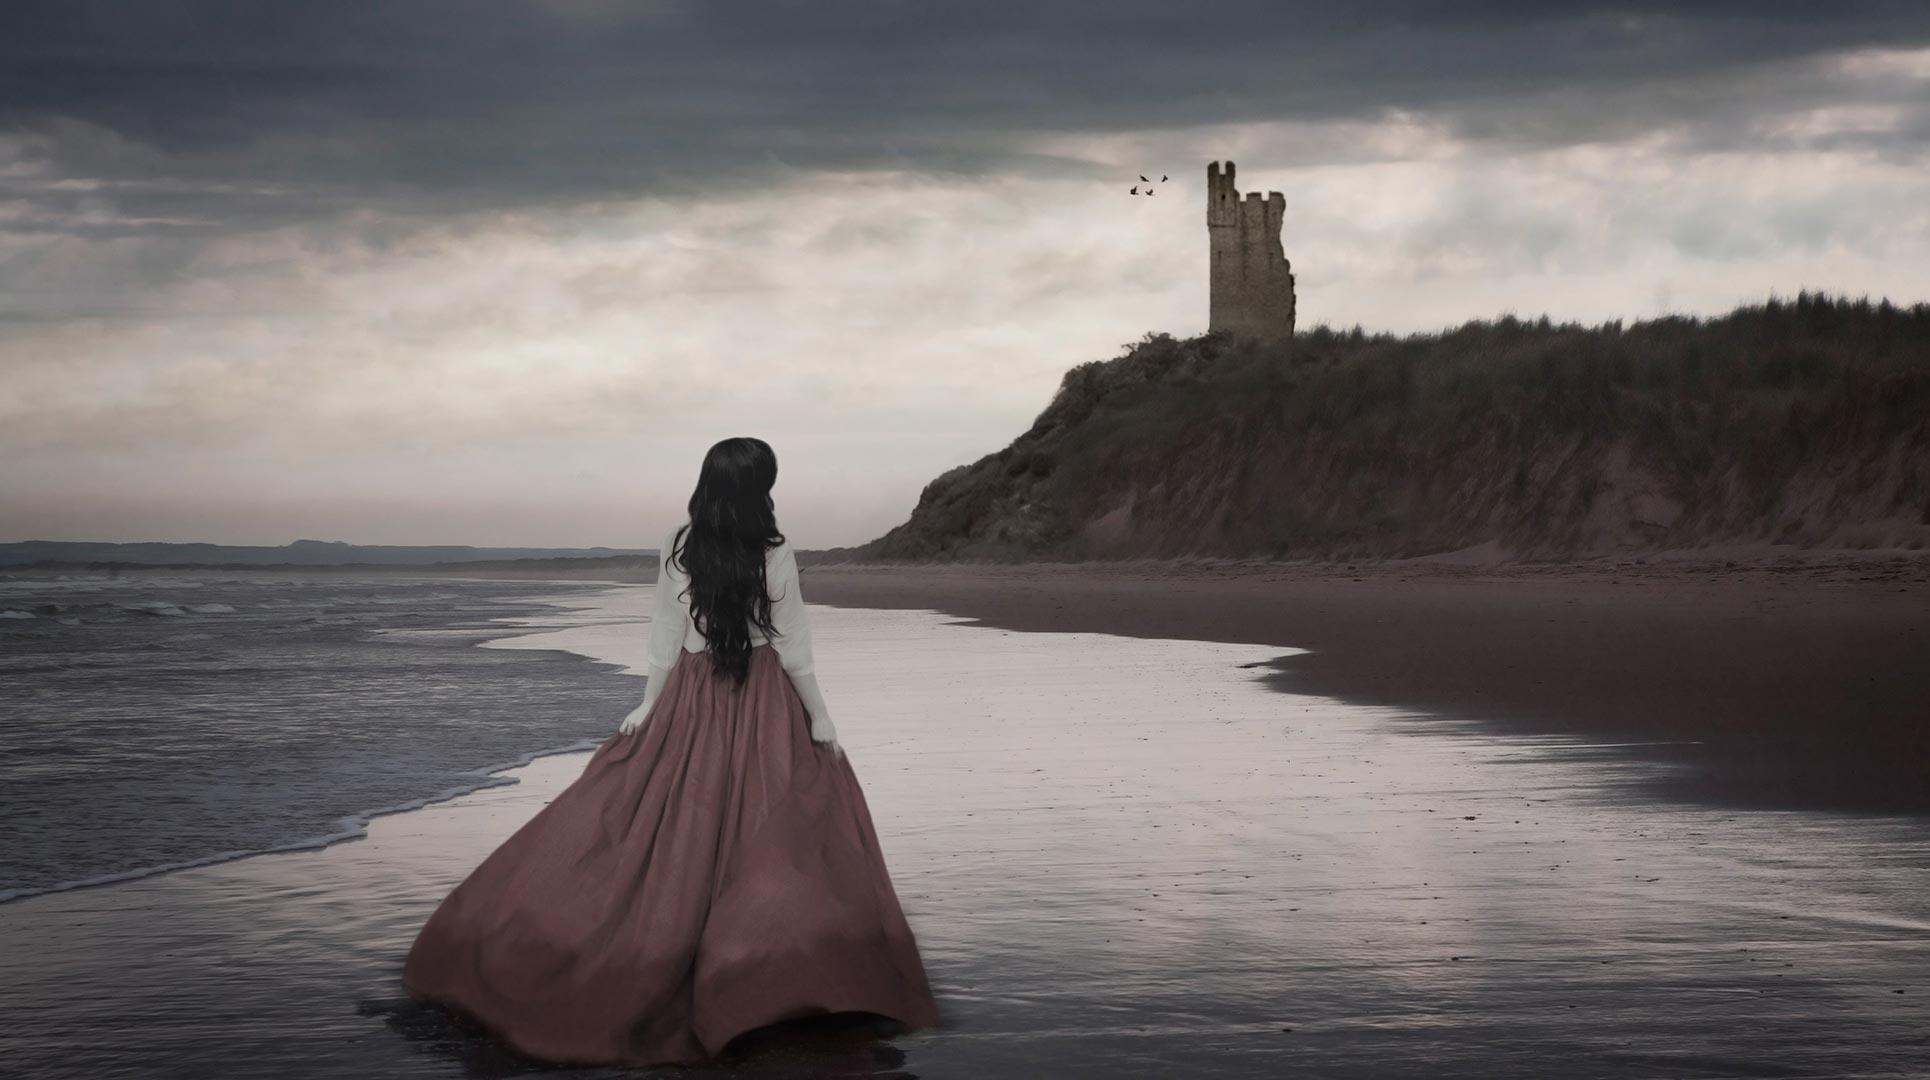 Nicola_Taylor_Art_Photographer_The_Calling_1